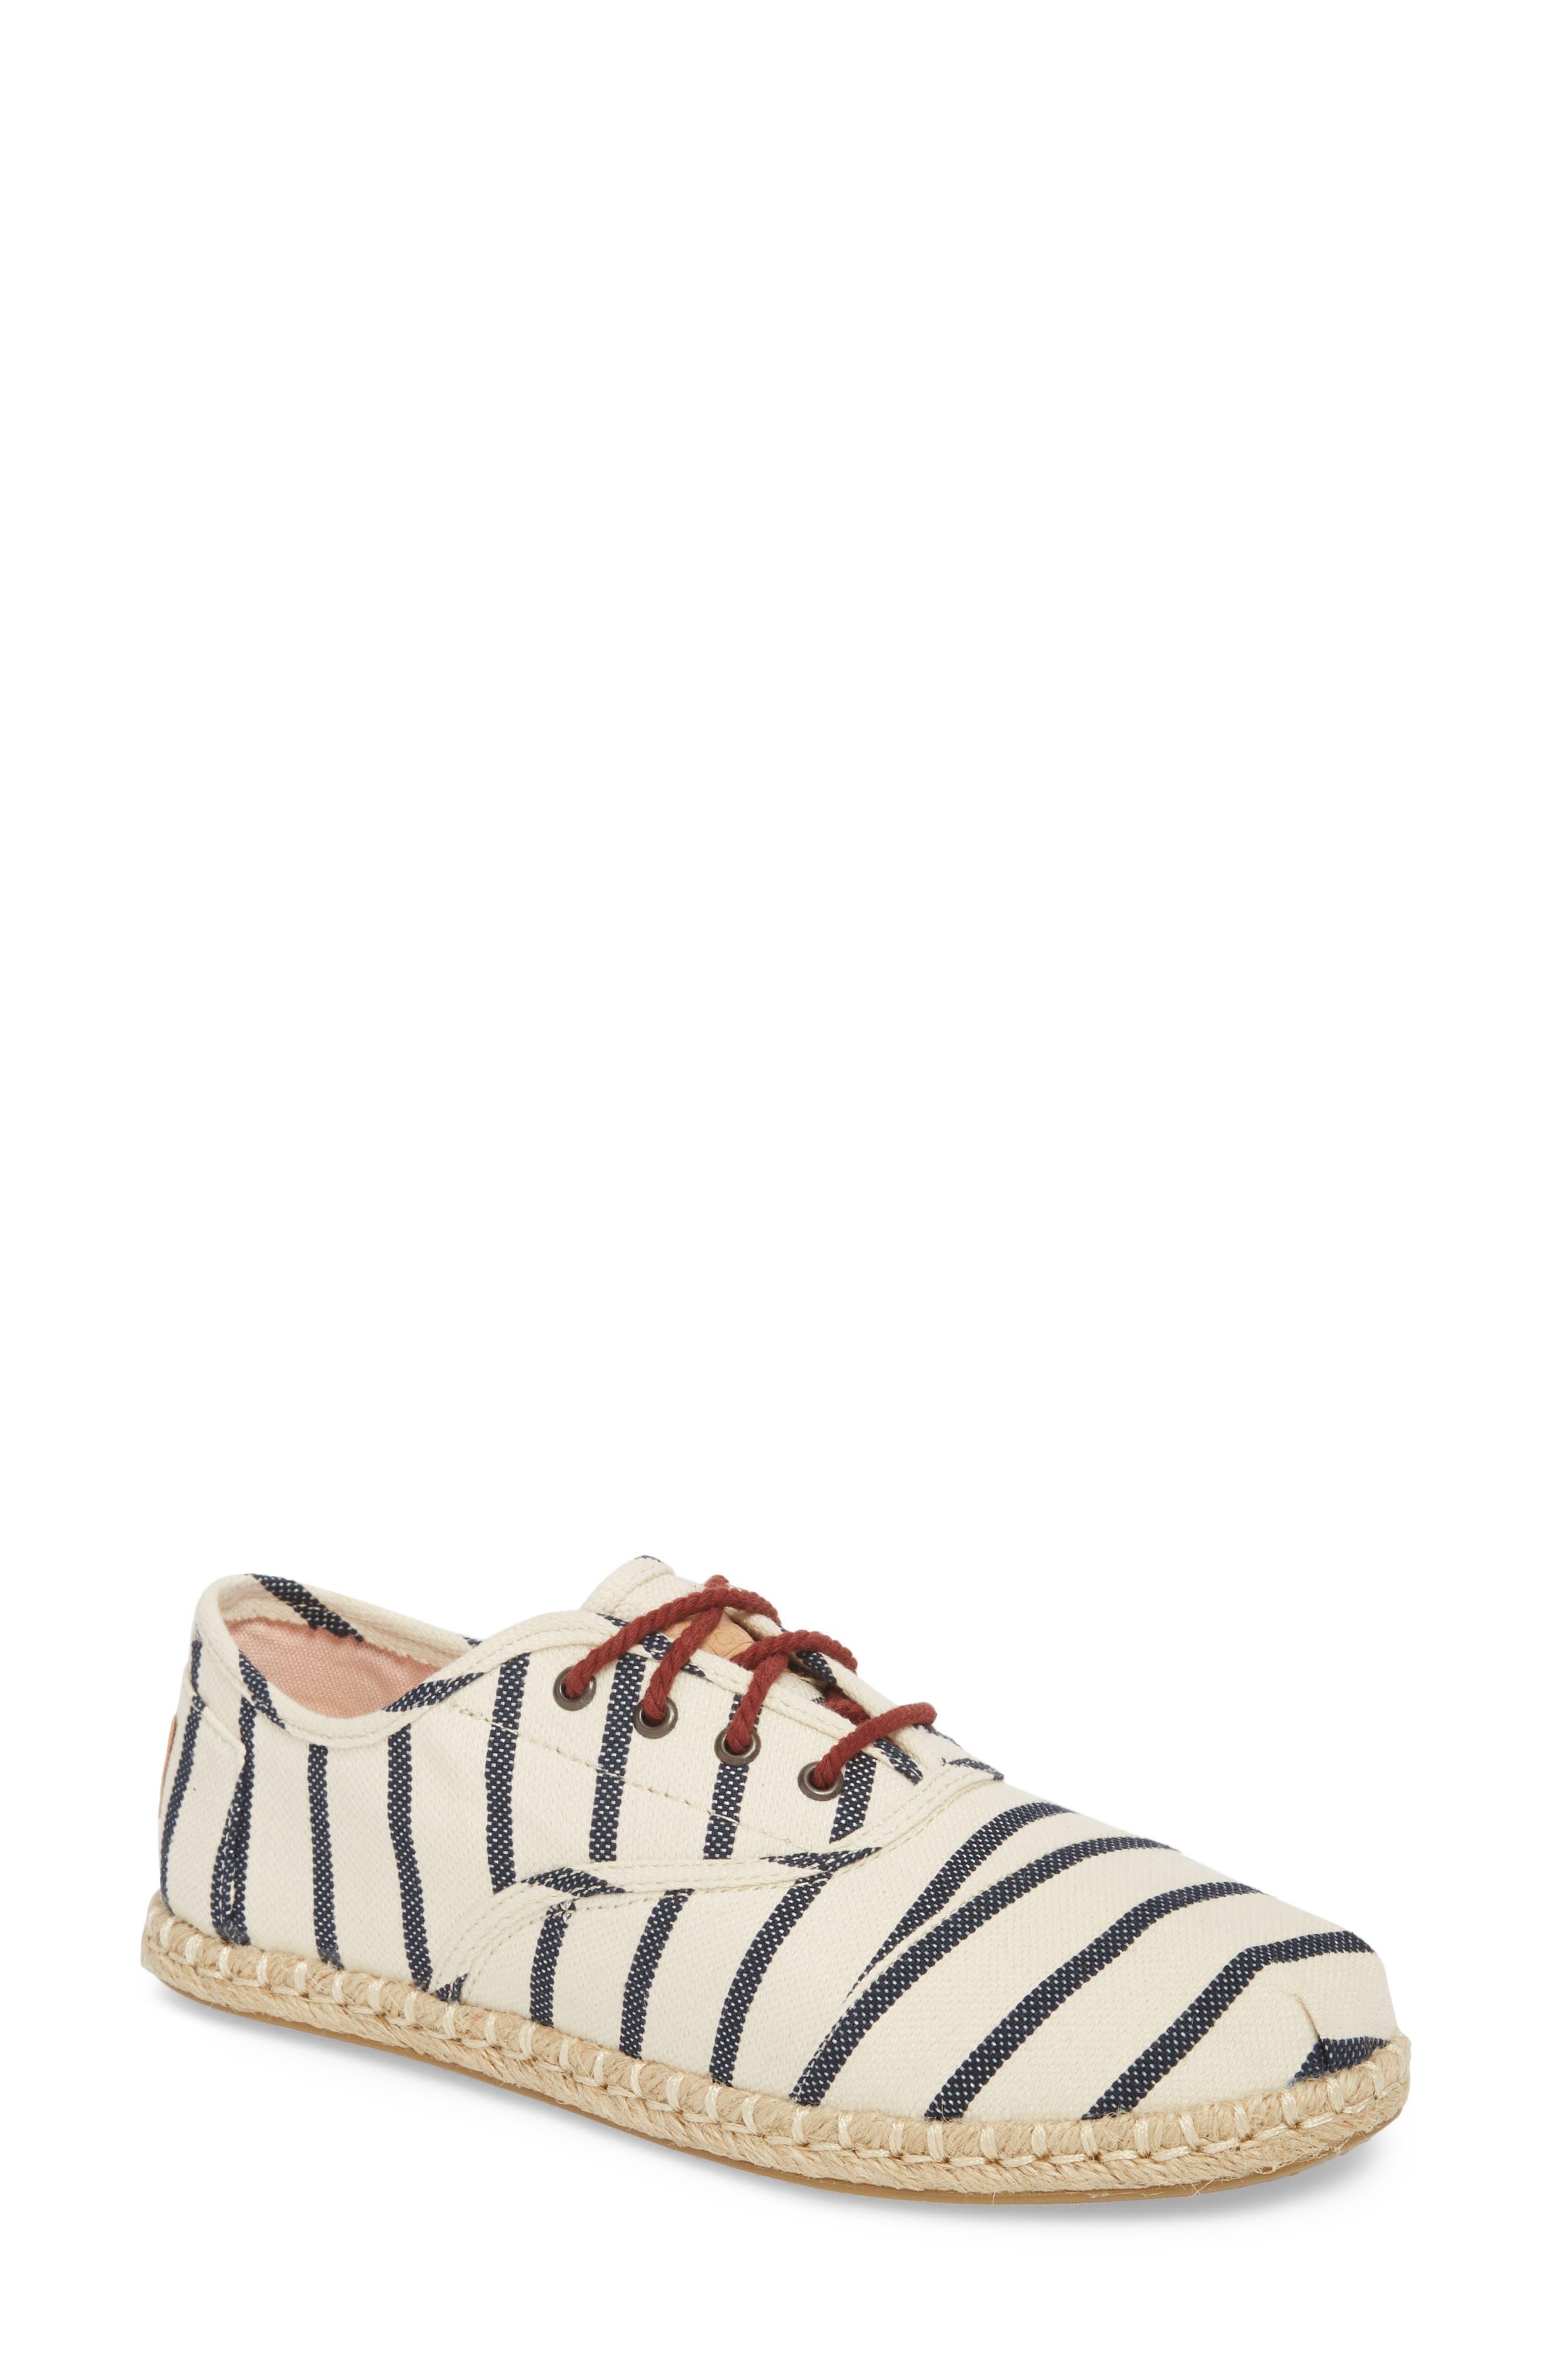 Cordones Sneaker,                             Main thumbnail 1, color,                             900